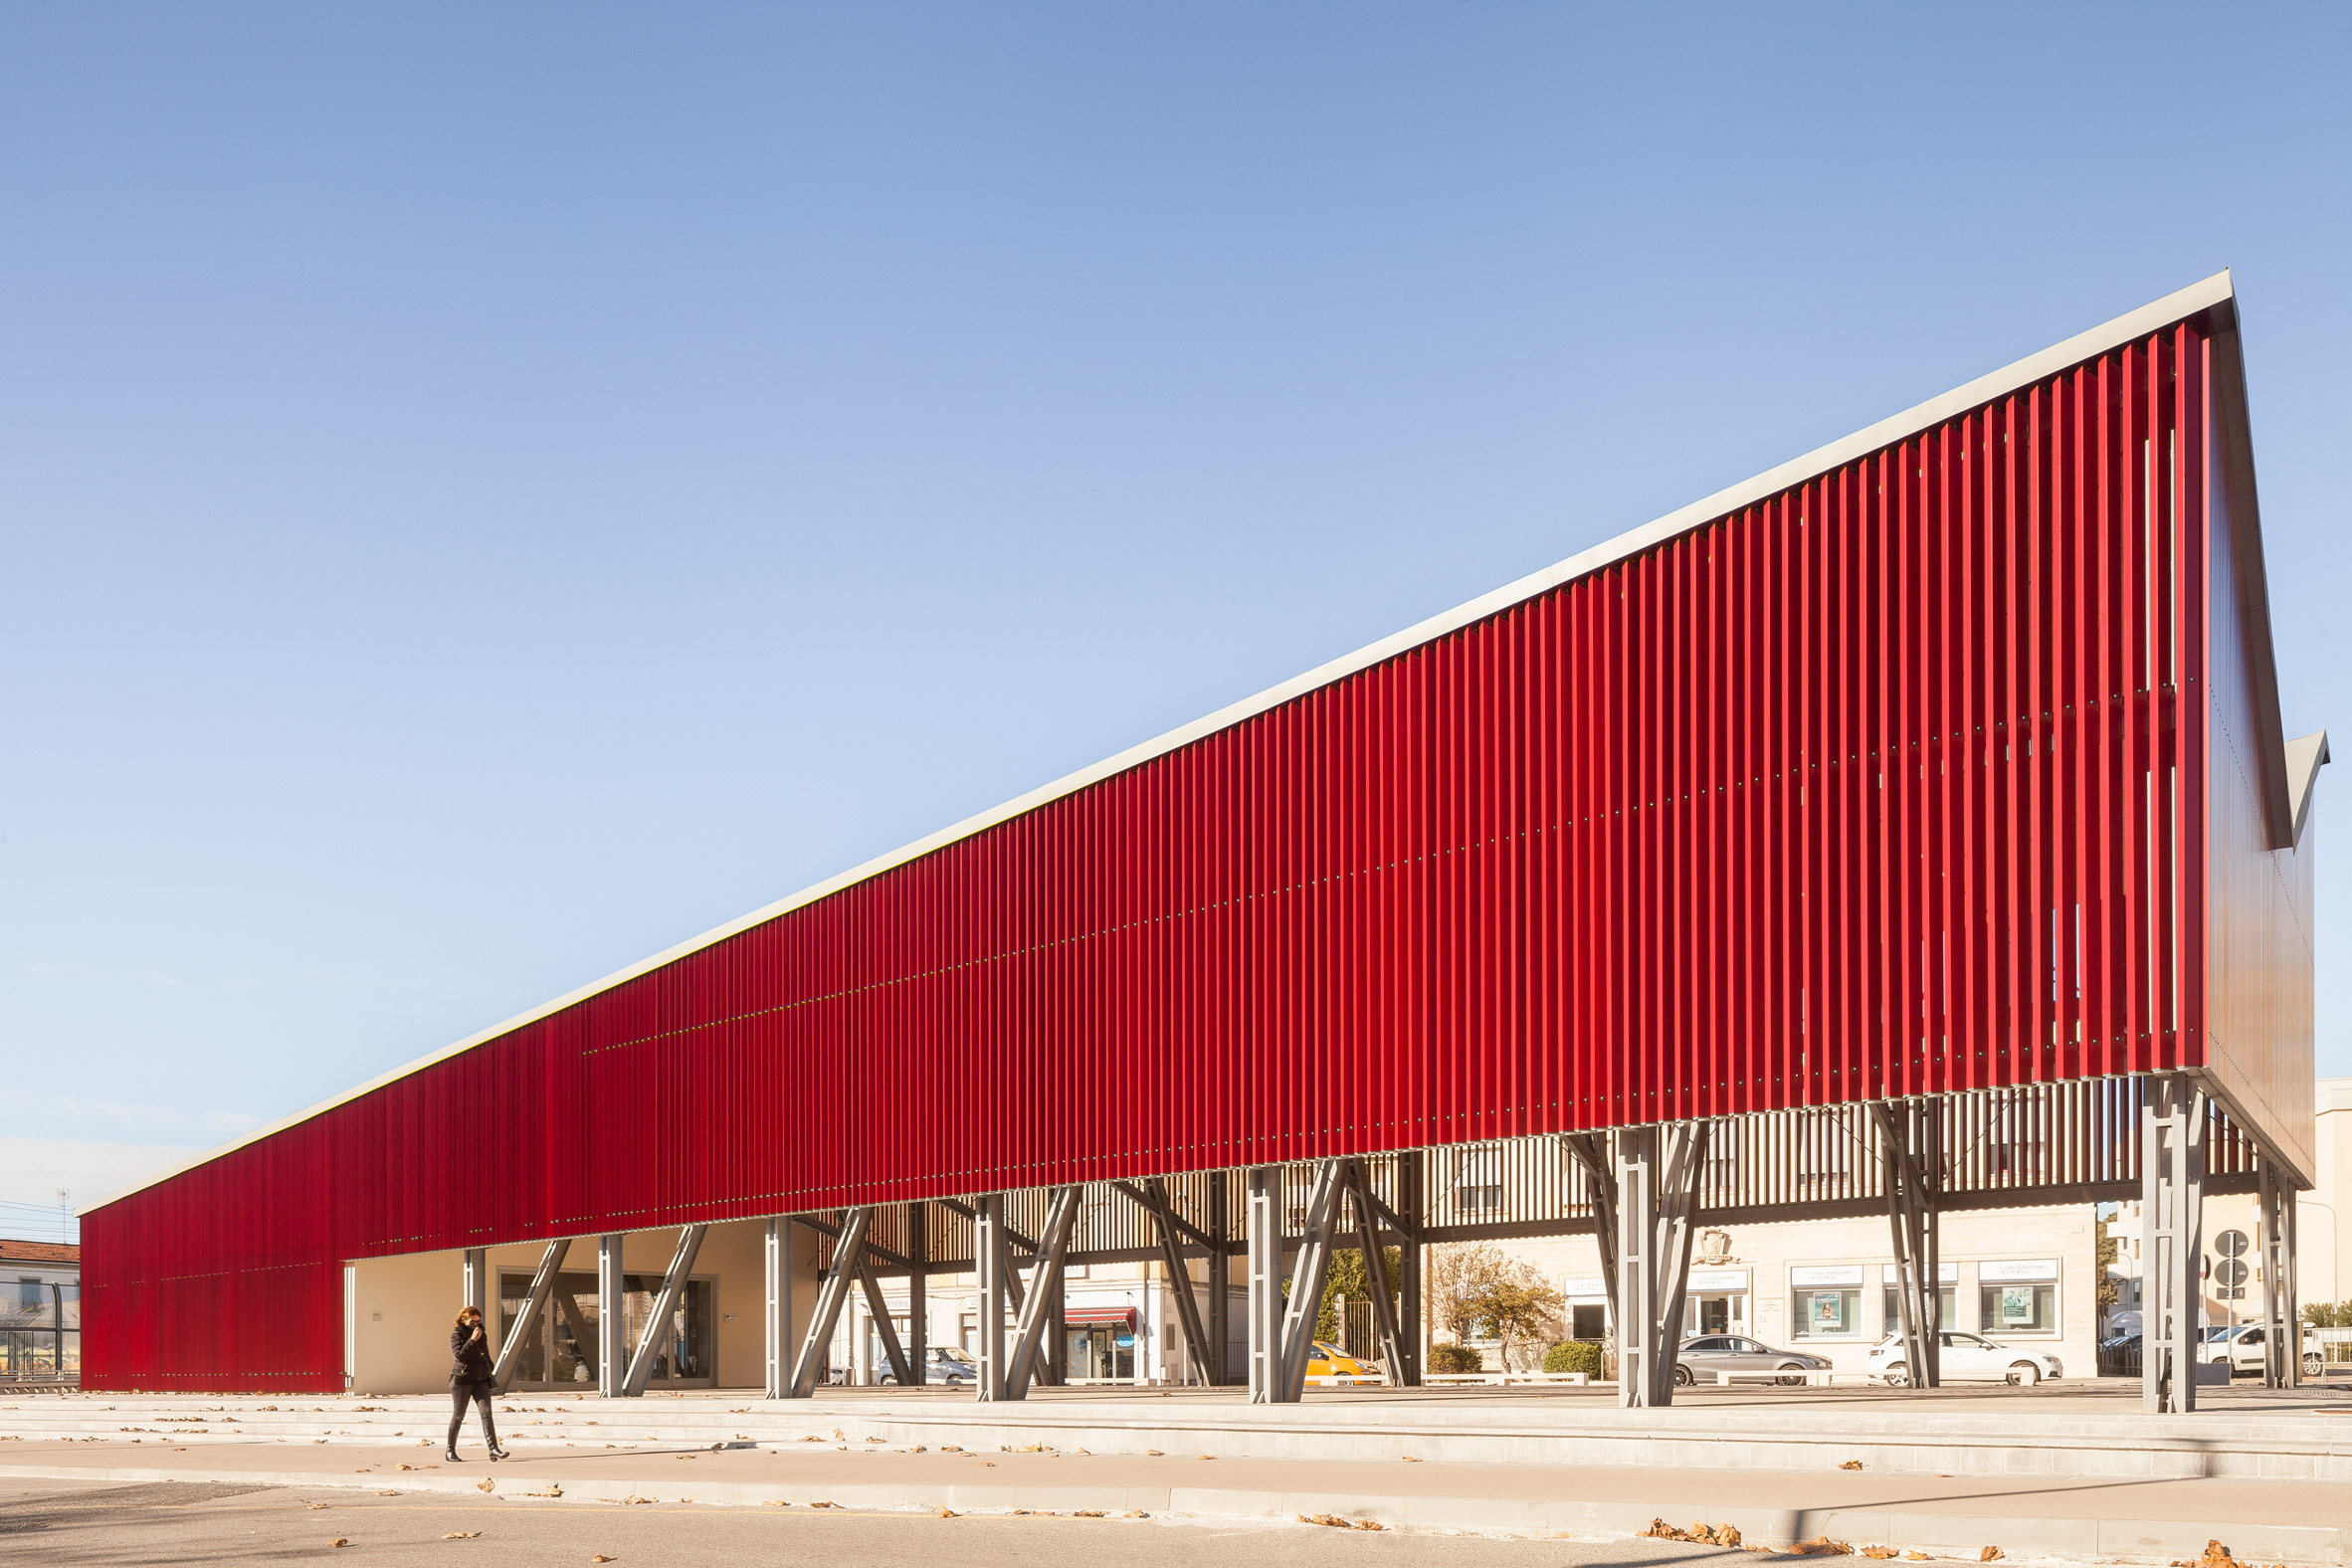 A pavilion clad in red aluminium slats